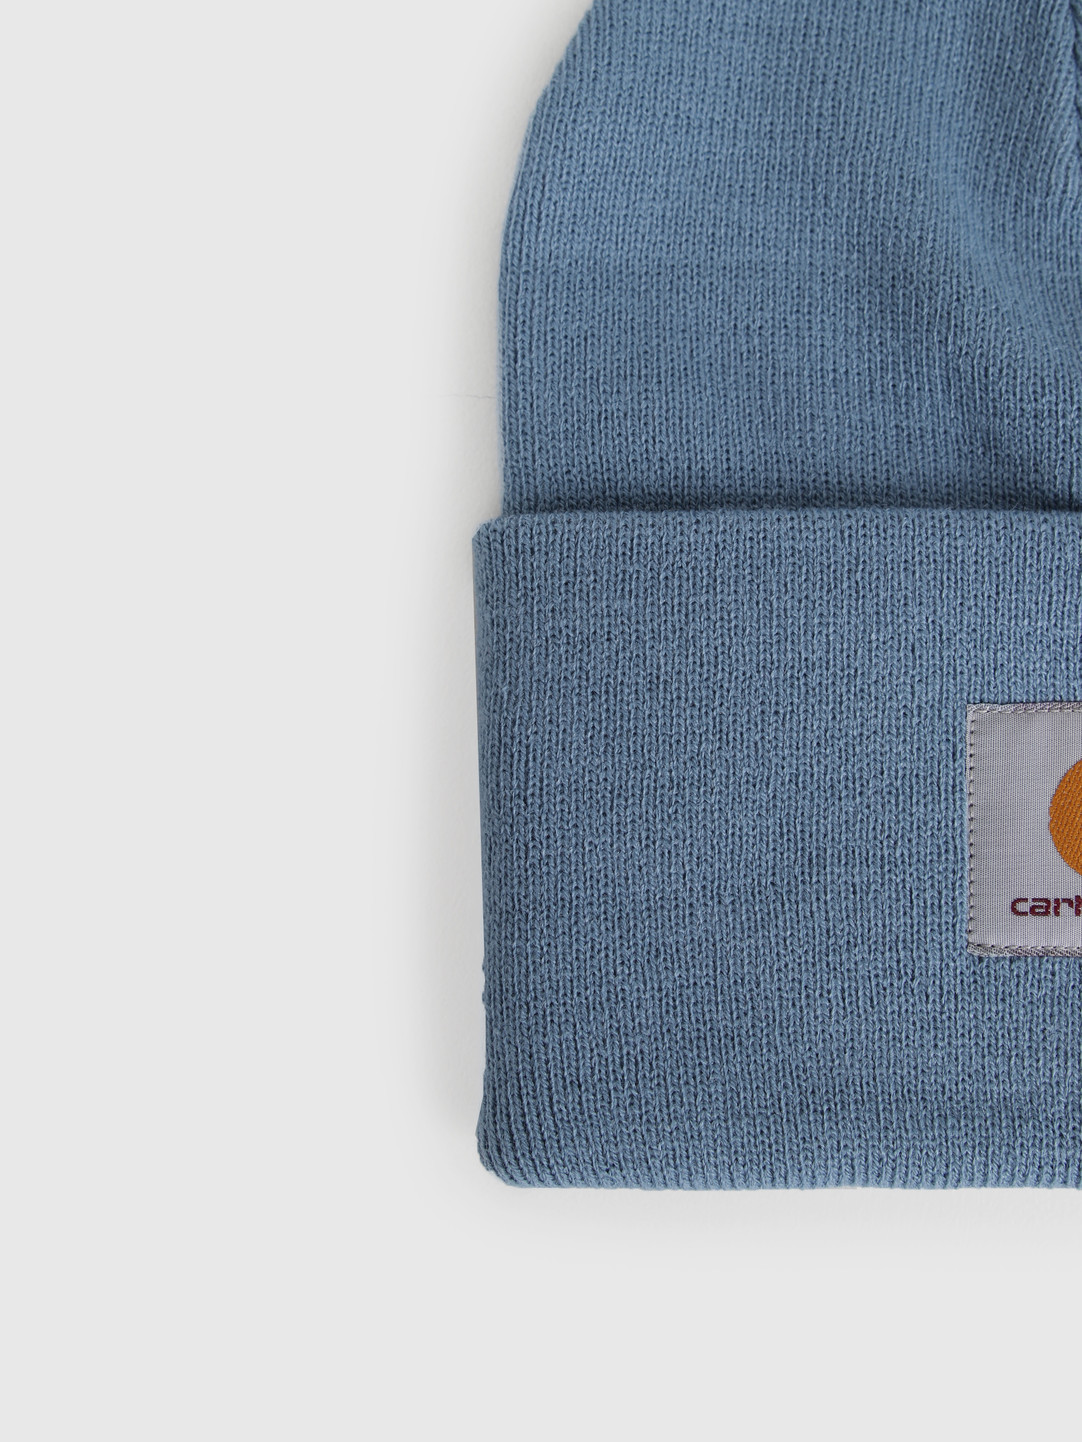 Carhartt WIP Carhartt WIP Acrylic Watch Hat Cold Blue I020222